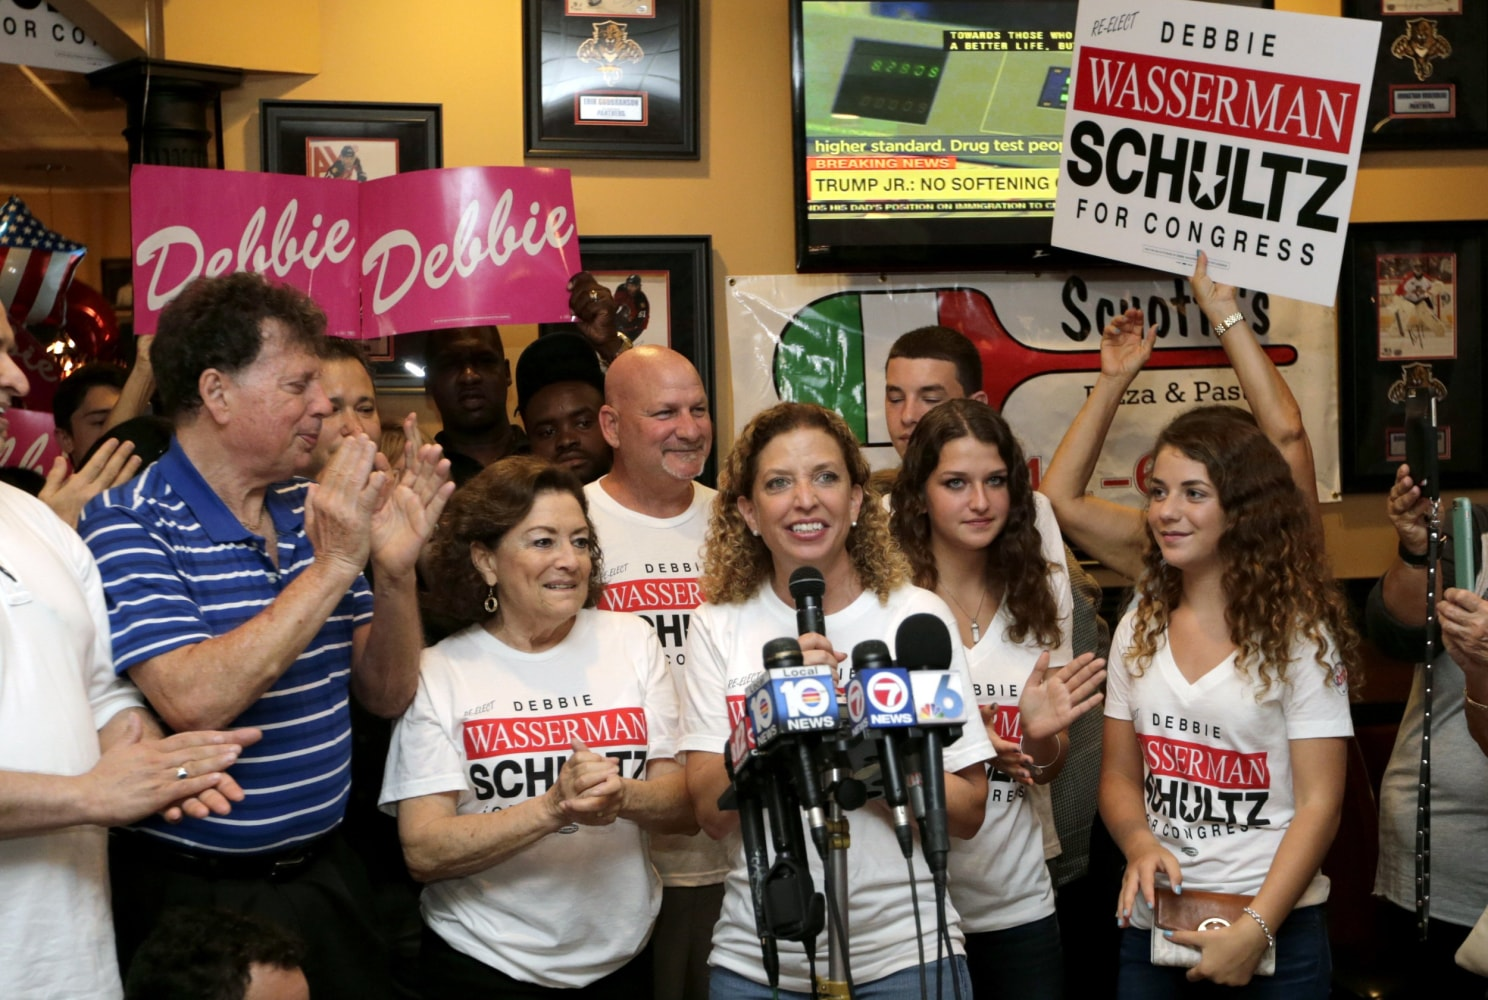 Senators Rubio, McCain win their Republican primaries